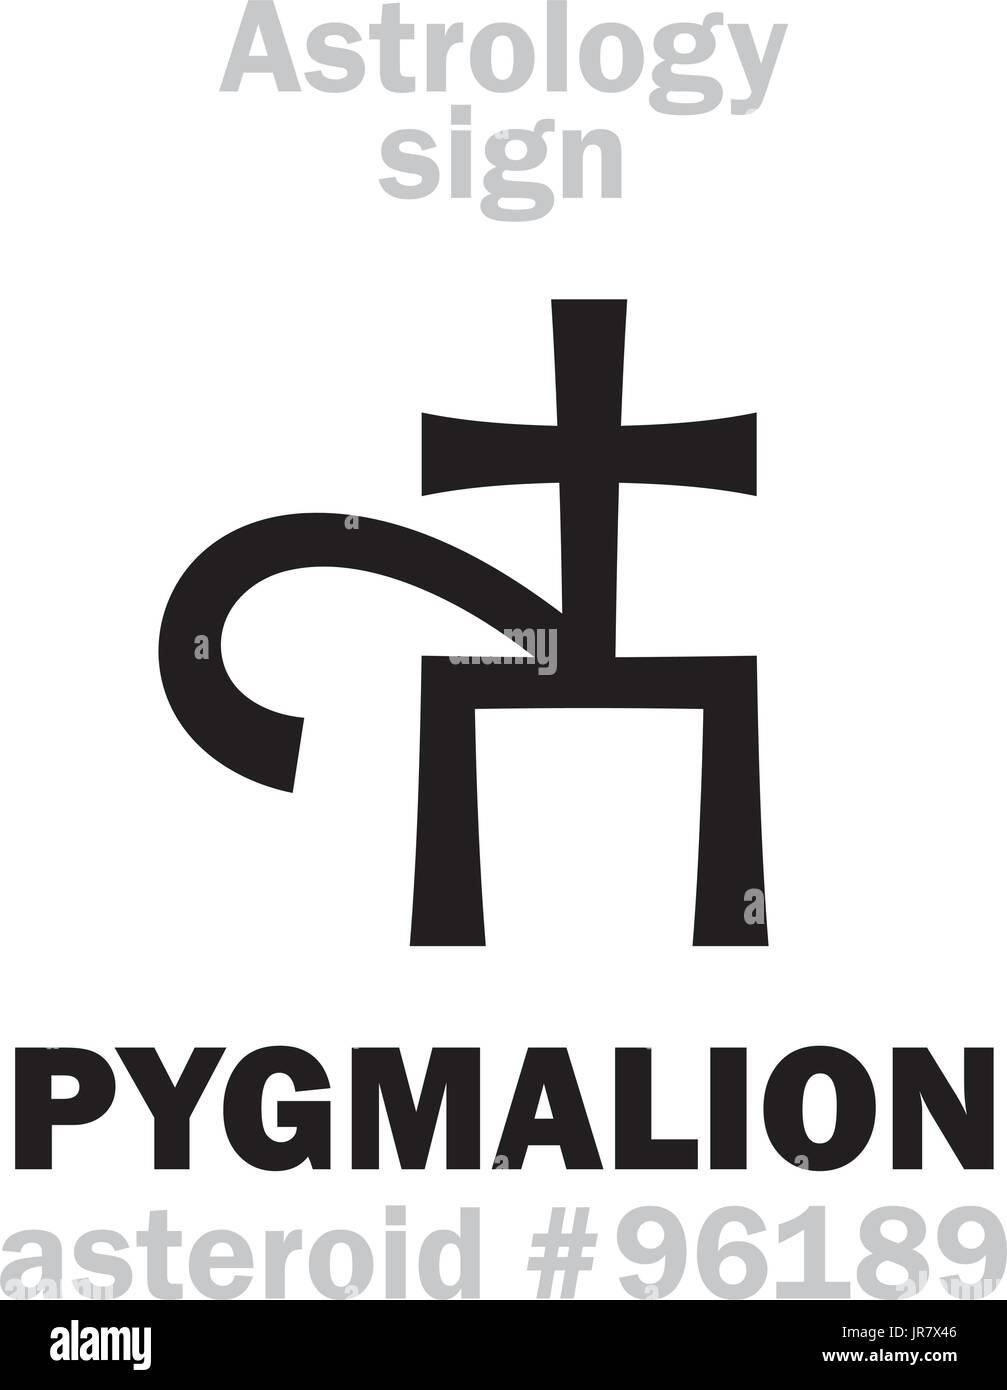 Pygmalion stock vector images alamy astrology alphabet pygmalion asteroid 96189 hieroglyphics character sign single symbol buycottarizona